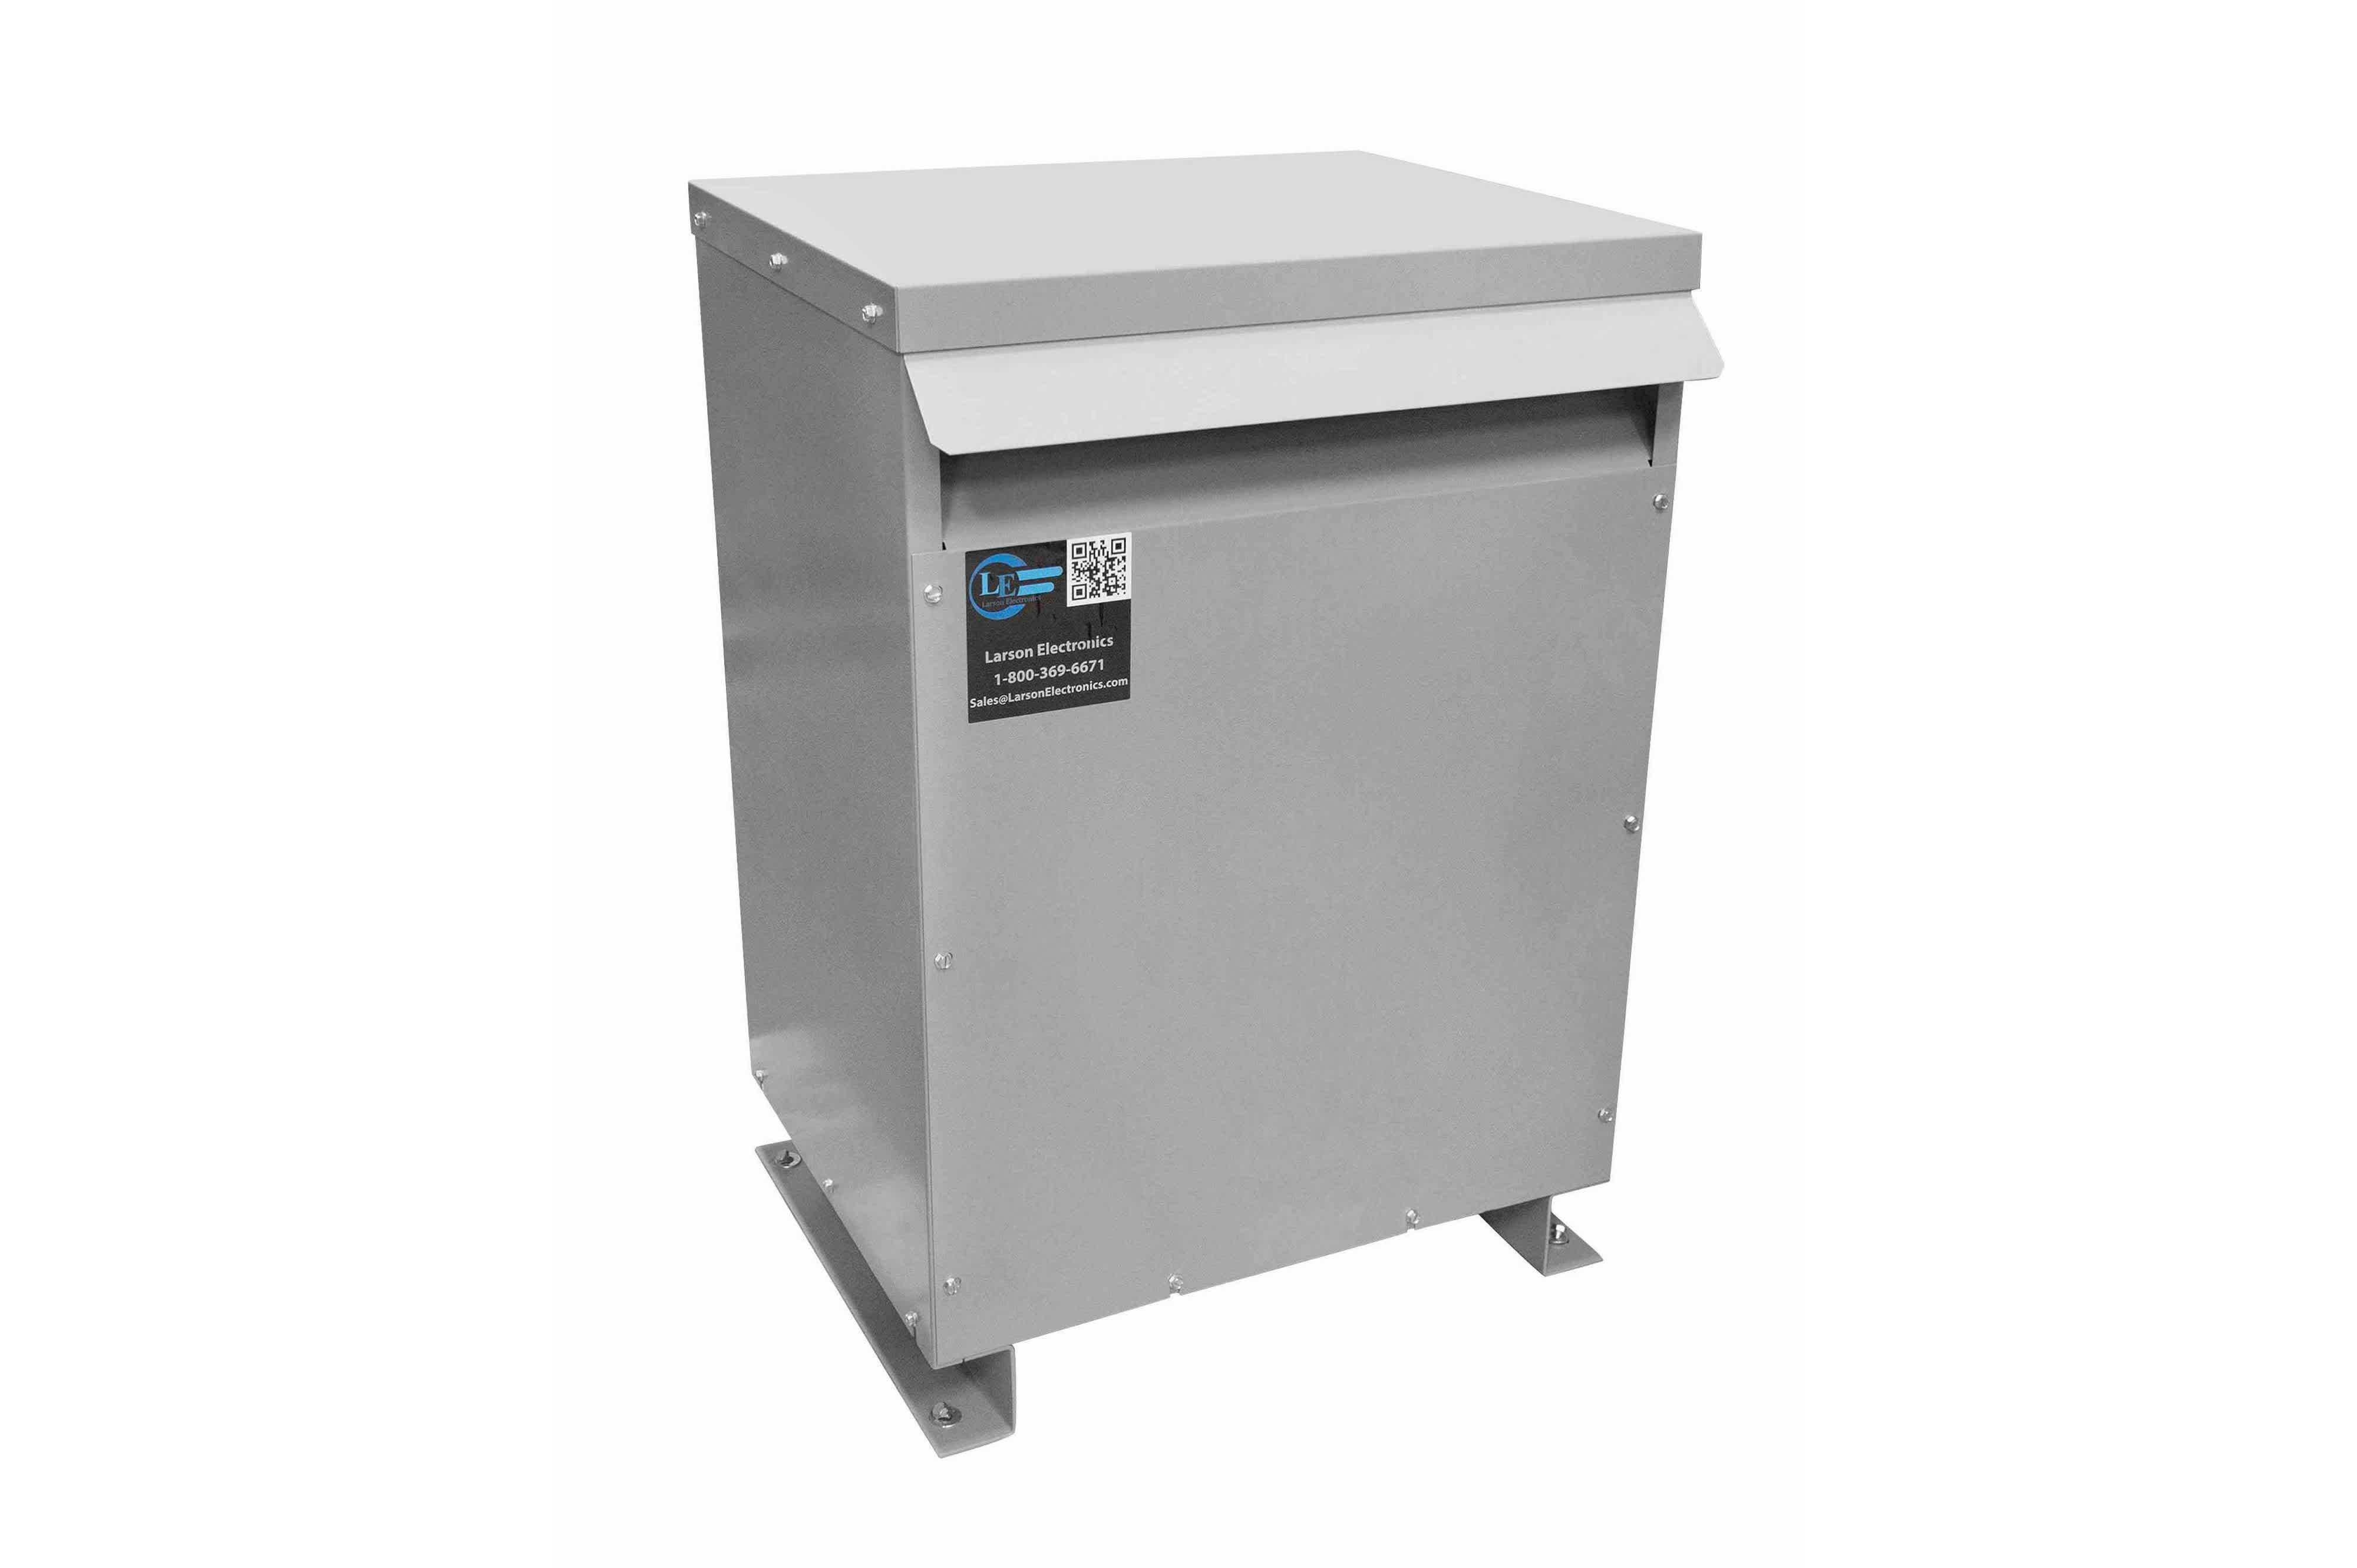 38 kVA 3PH DOE Transformer, 220V Delta Primary, 208Y/120 Wye-N Secondary, N3R, Ventilated, 60 Hz